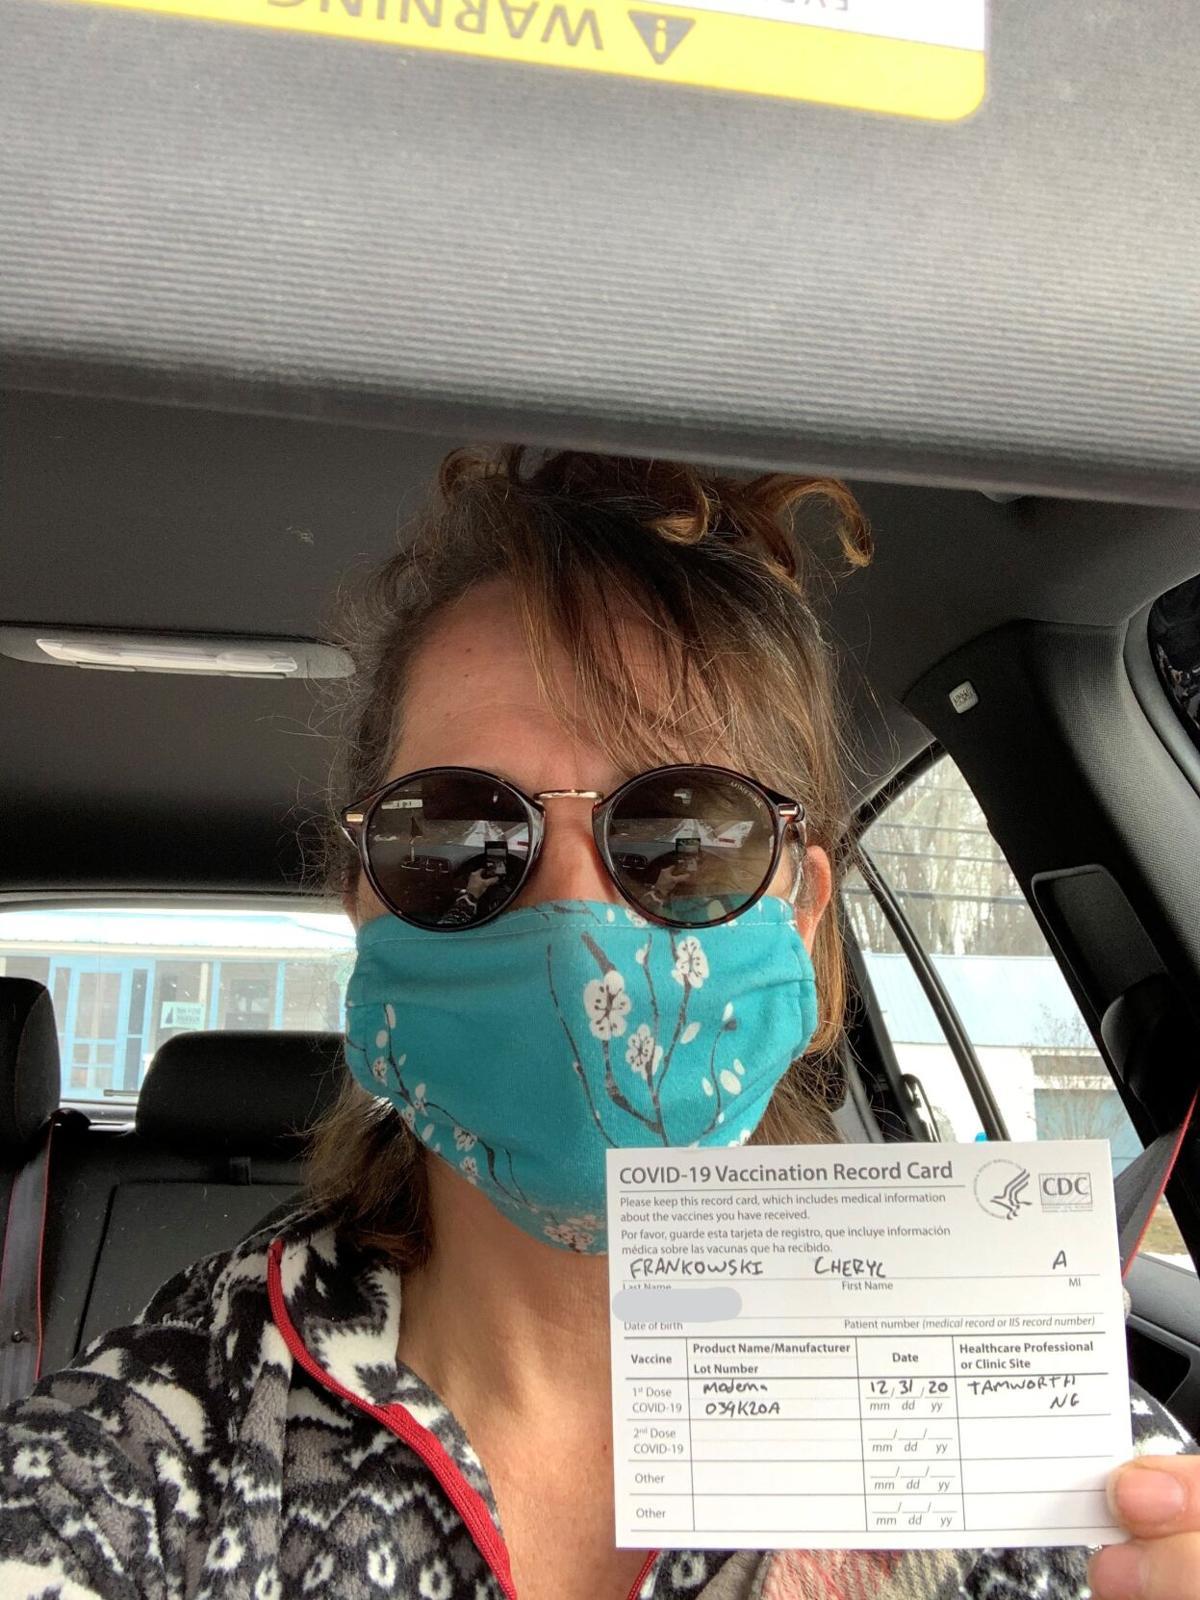 Cheryl Frankowski COVID vaccination